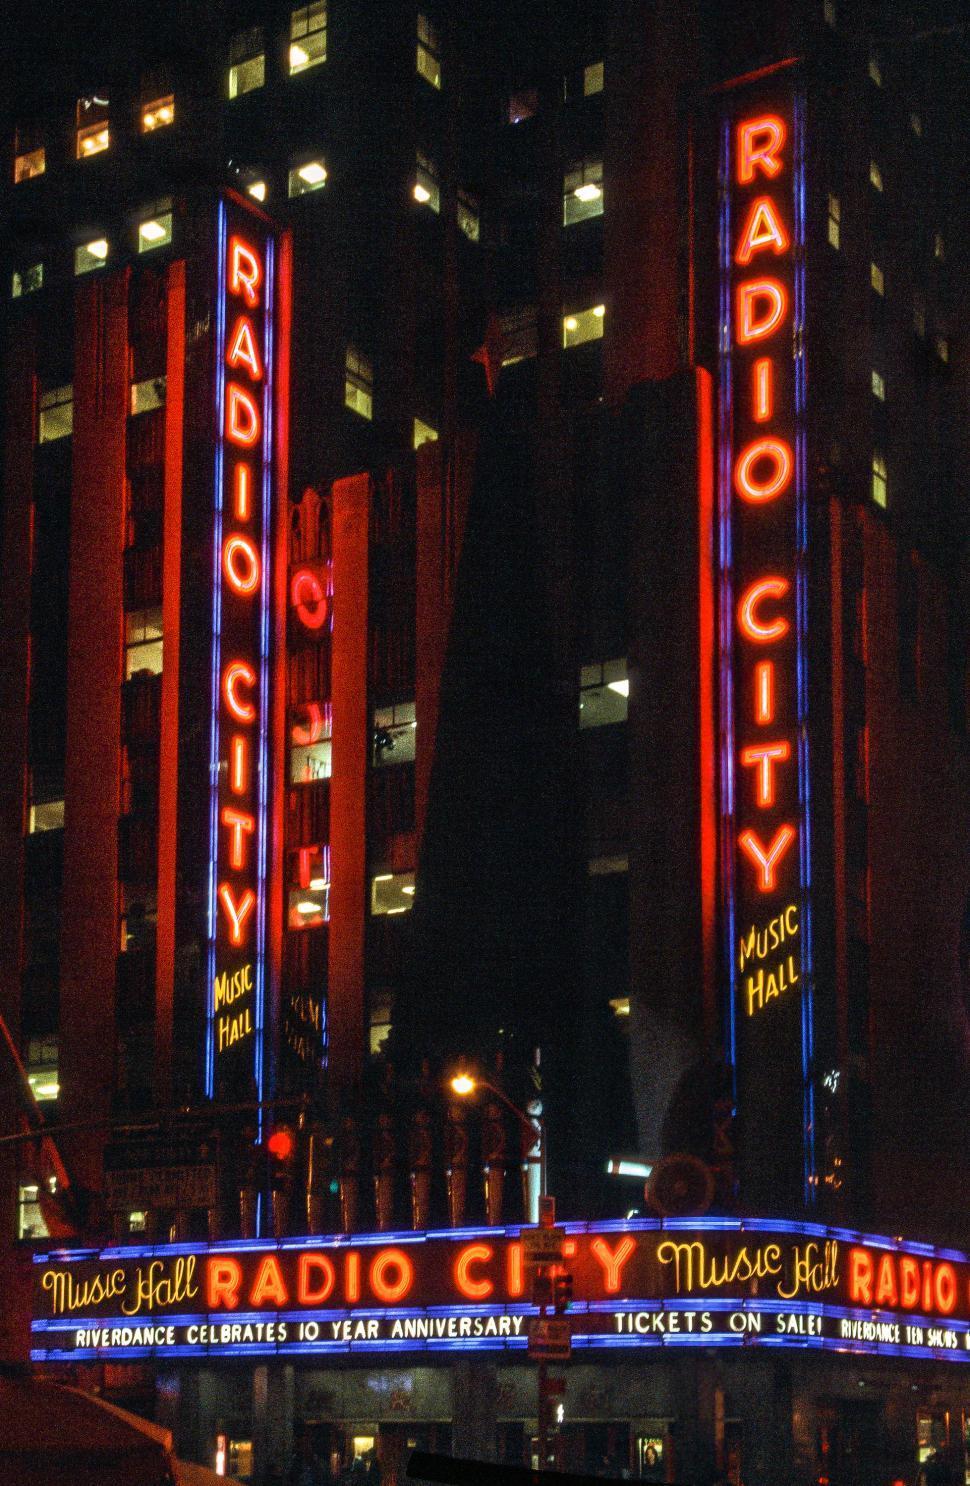 Download Free Stock HD Photo of Radio City Music Hall Online